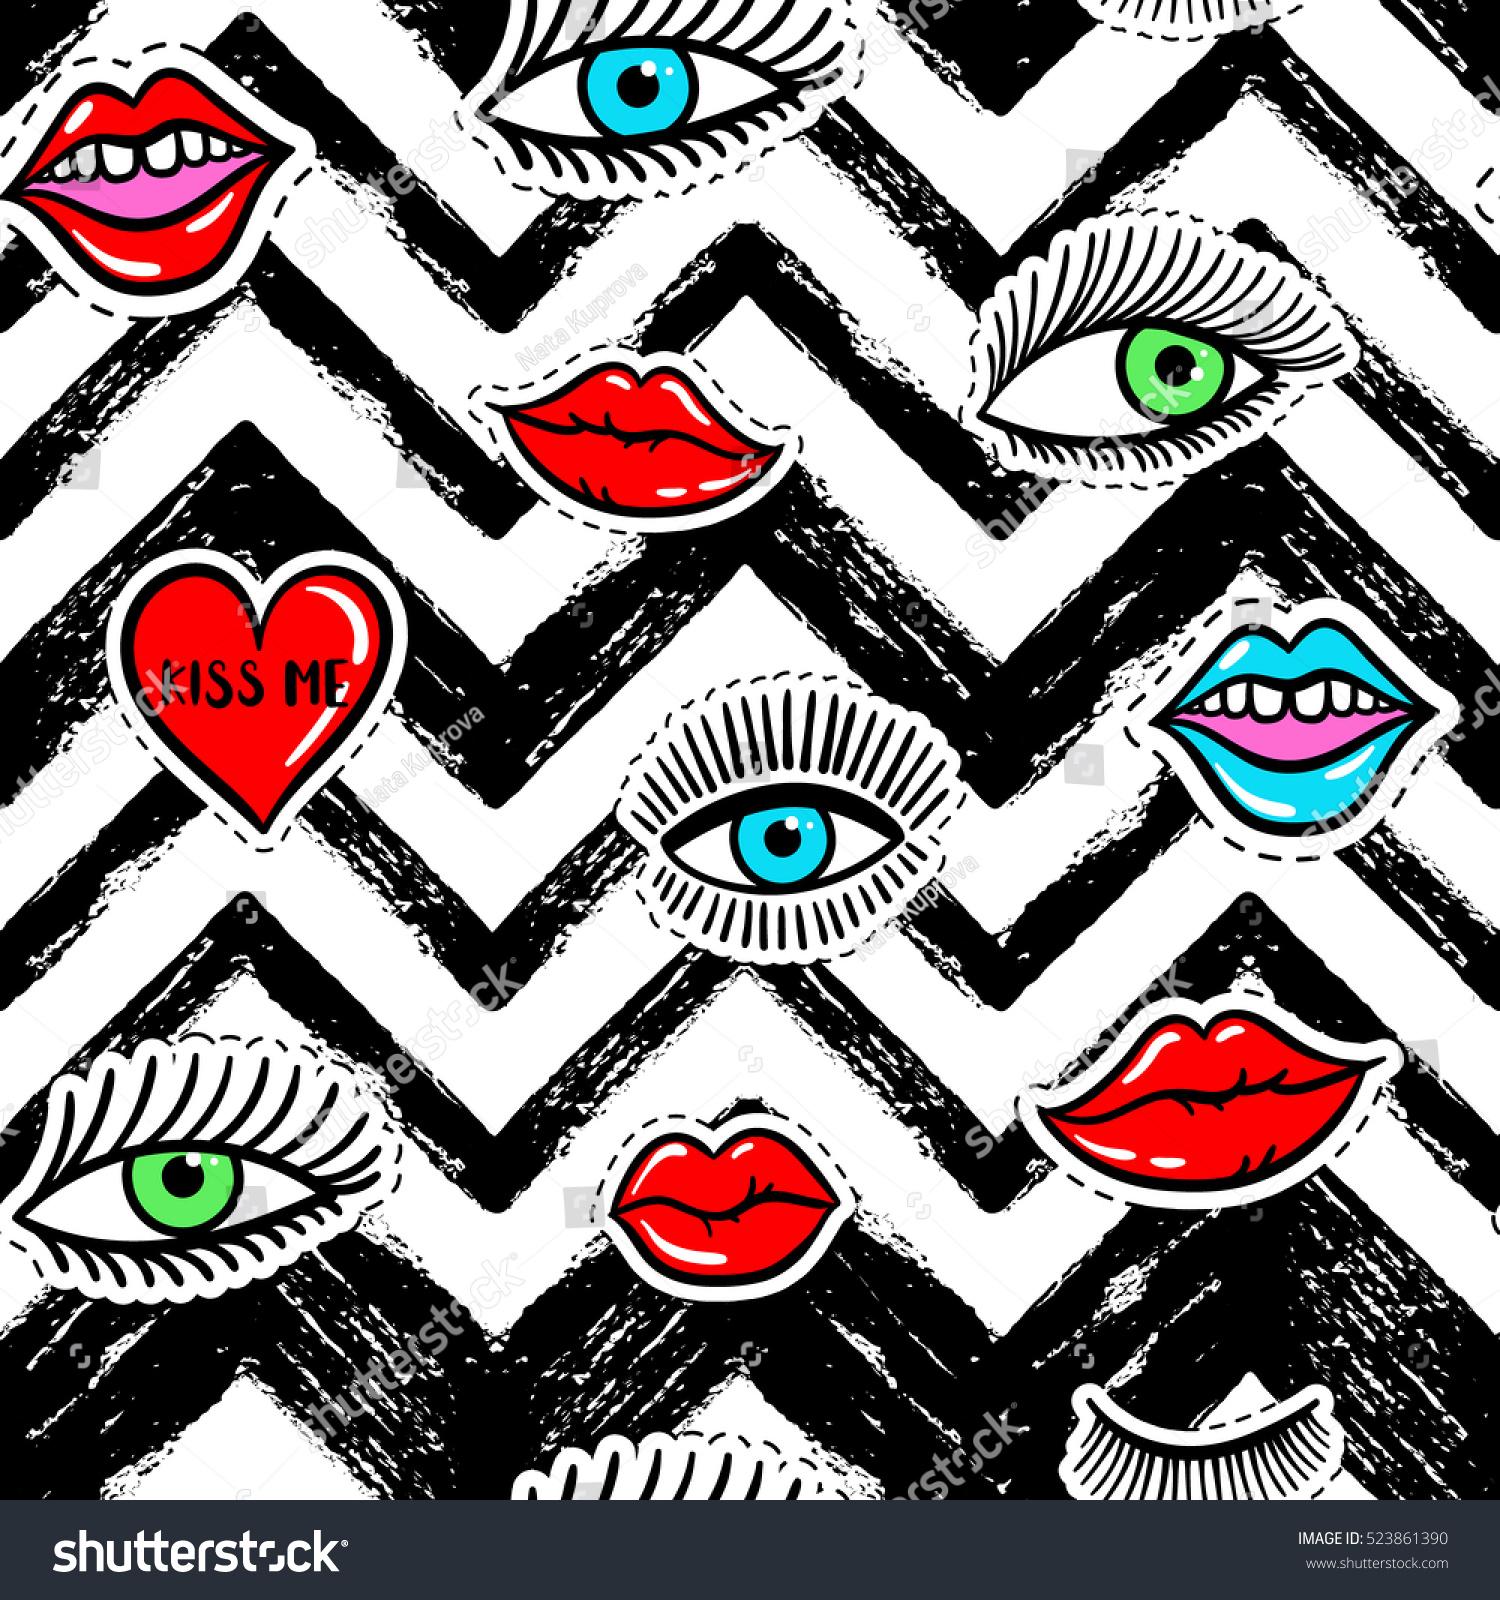 Black dress red lips stickers